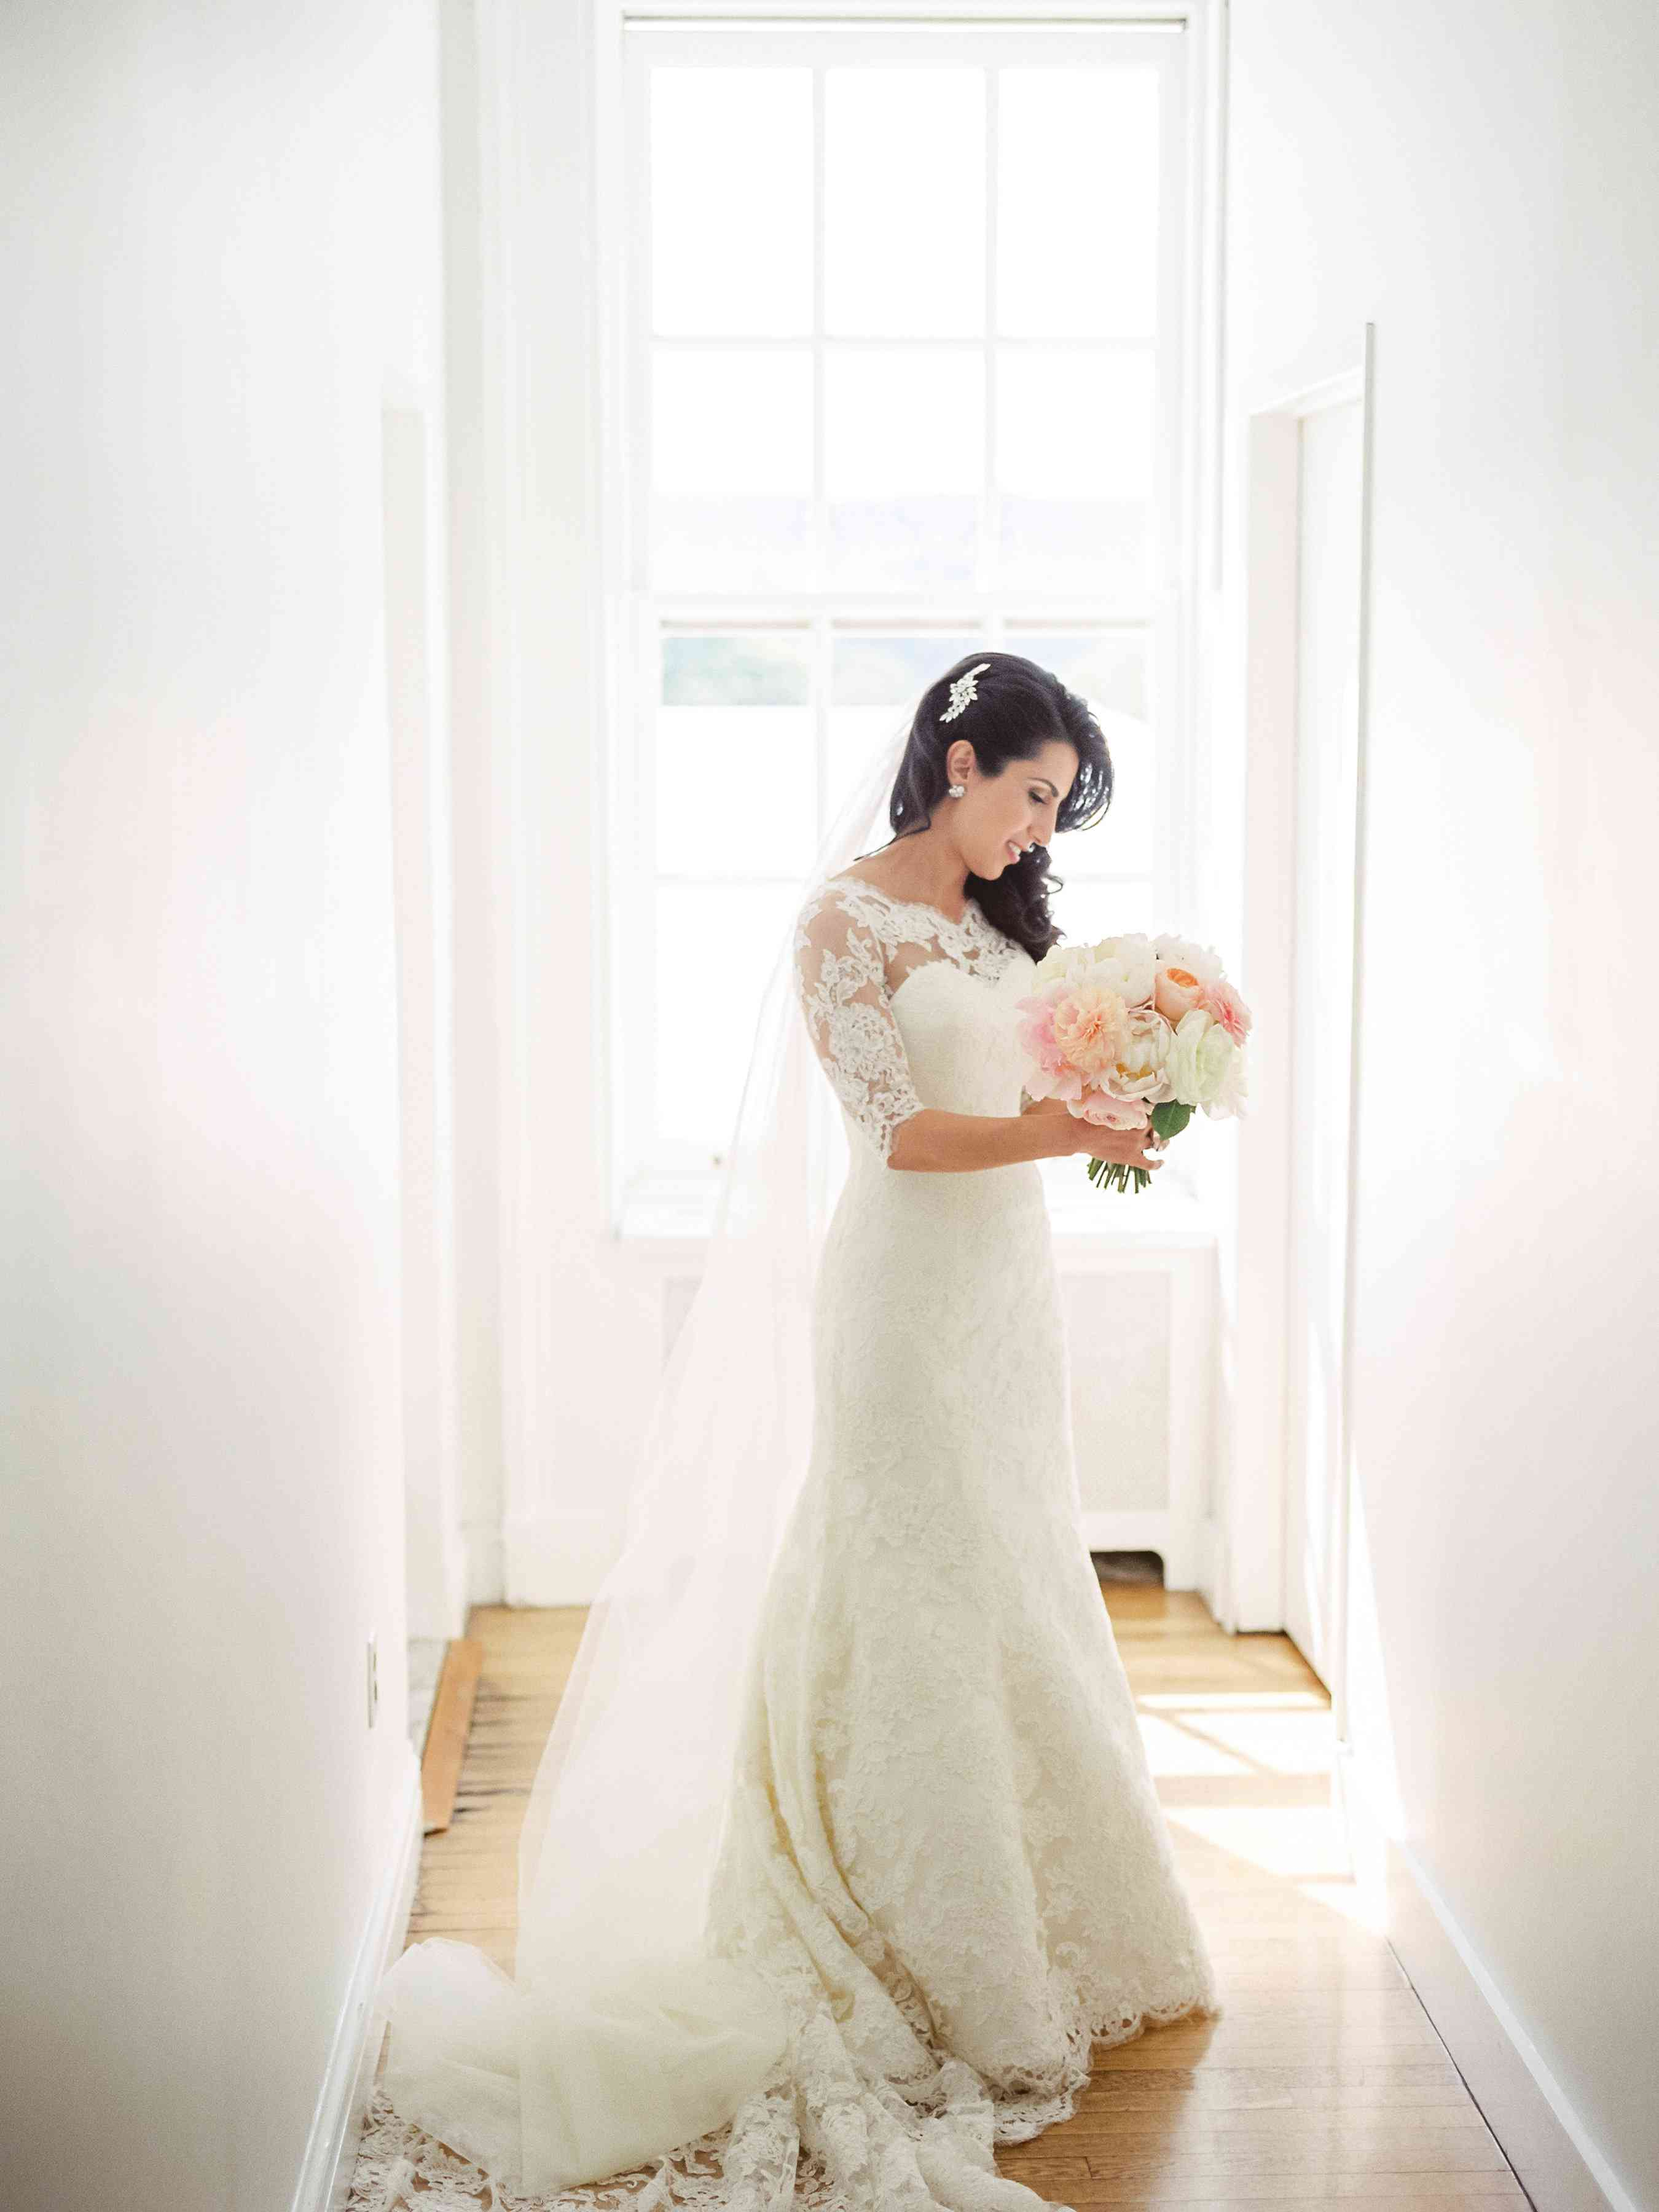 The bride in her wedding dress